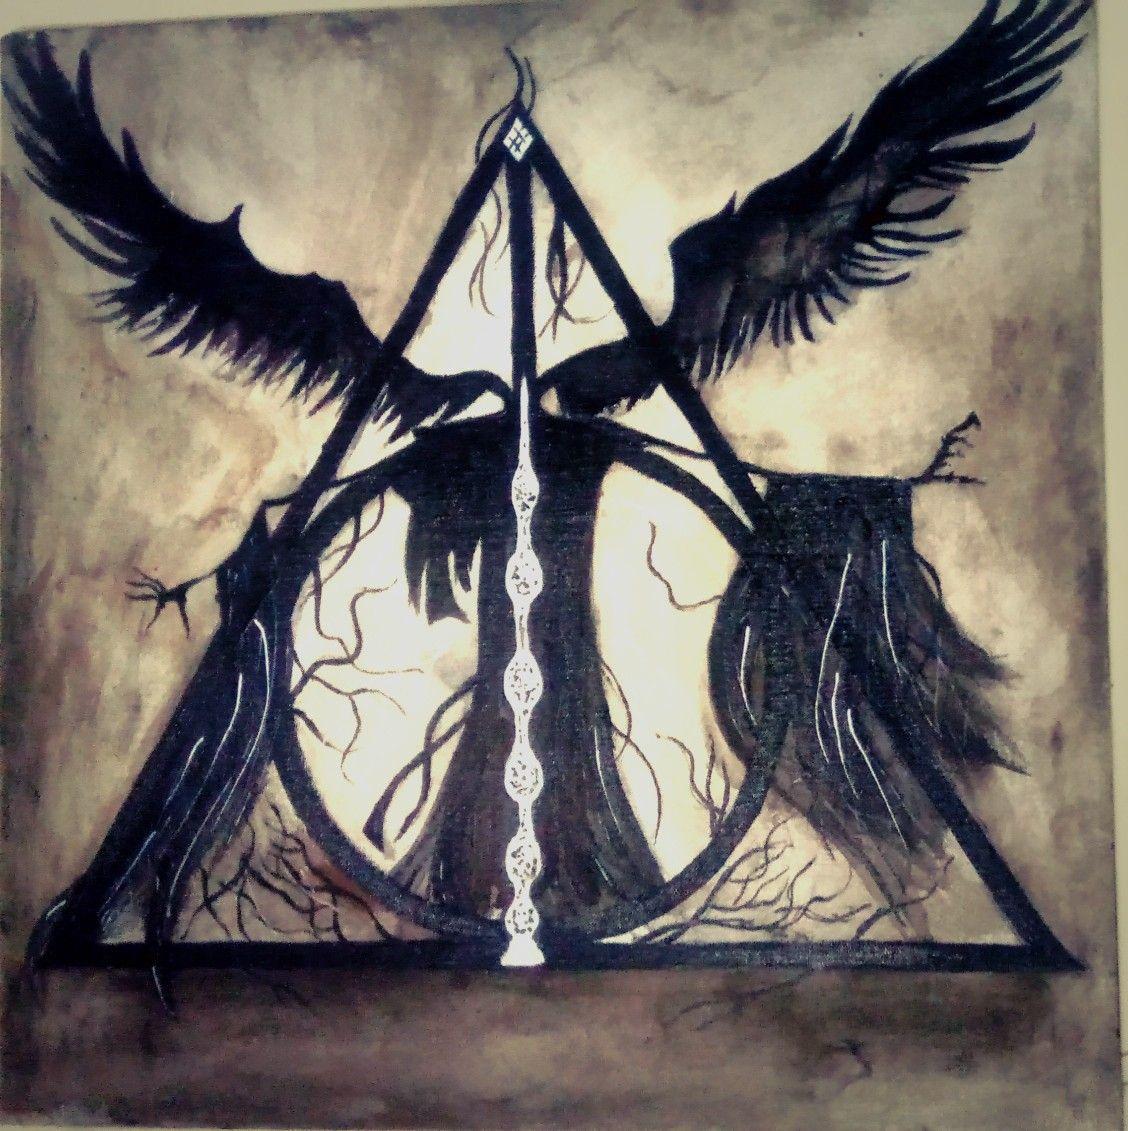 Harry Potter Deathly Hallows The Tale Of 3 Brothers Tattoo Reliquias Da Morte Harry Potter Desenho